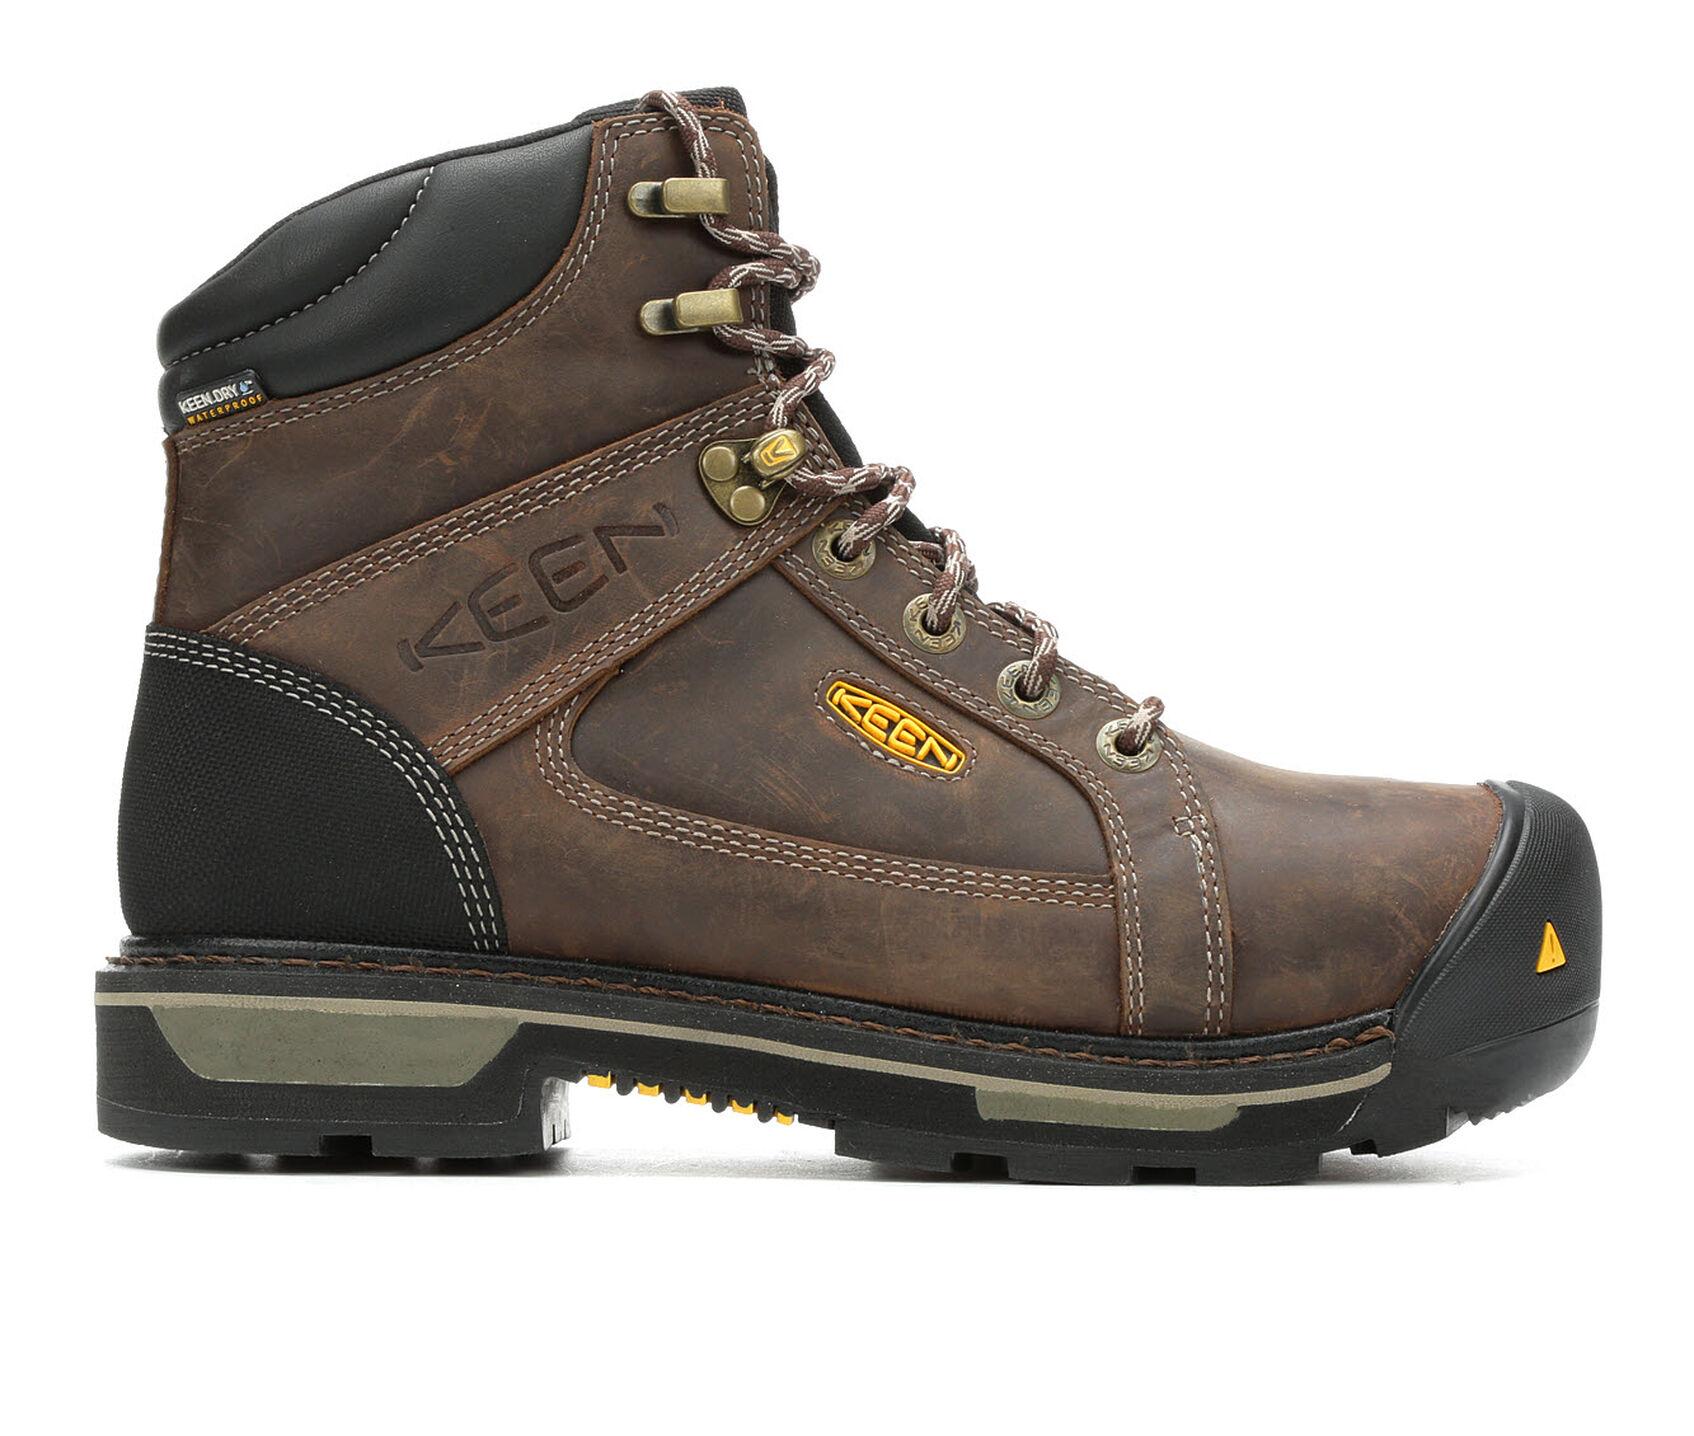 3c497e32c59 Men's KEEN Utility Rockford 6in Composite Toe Work Boots | Shoe Carnival